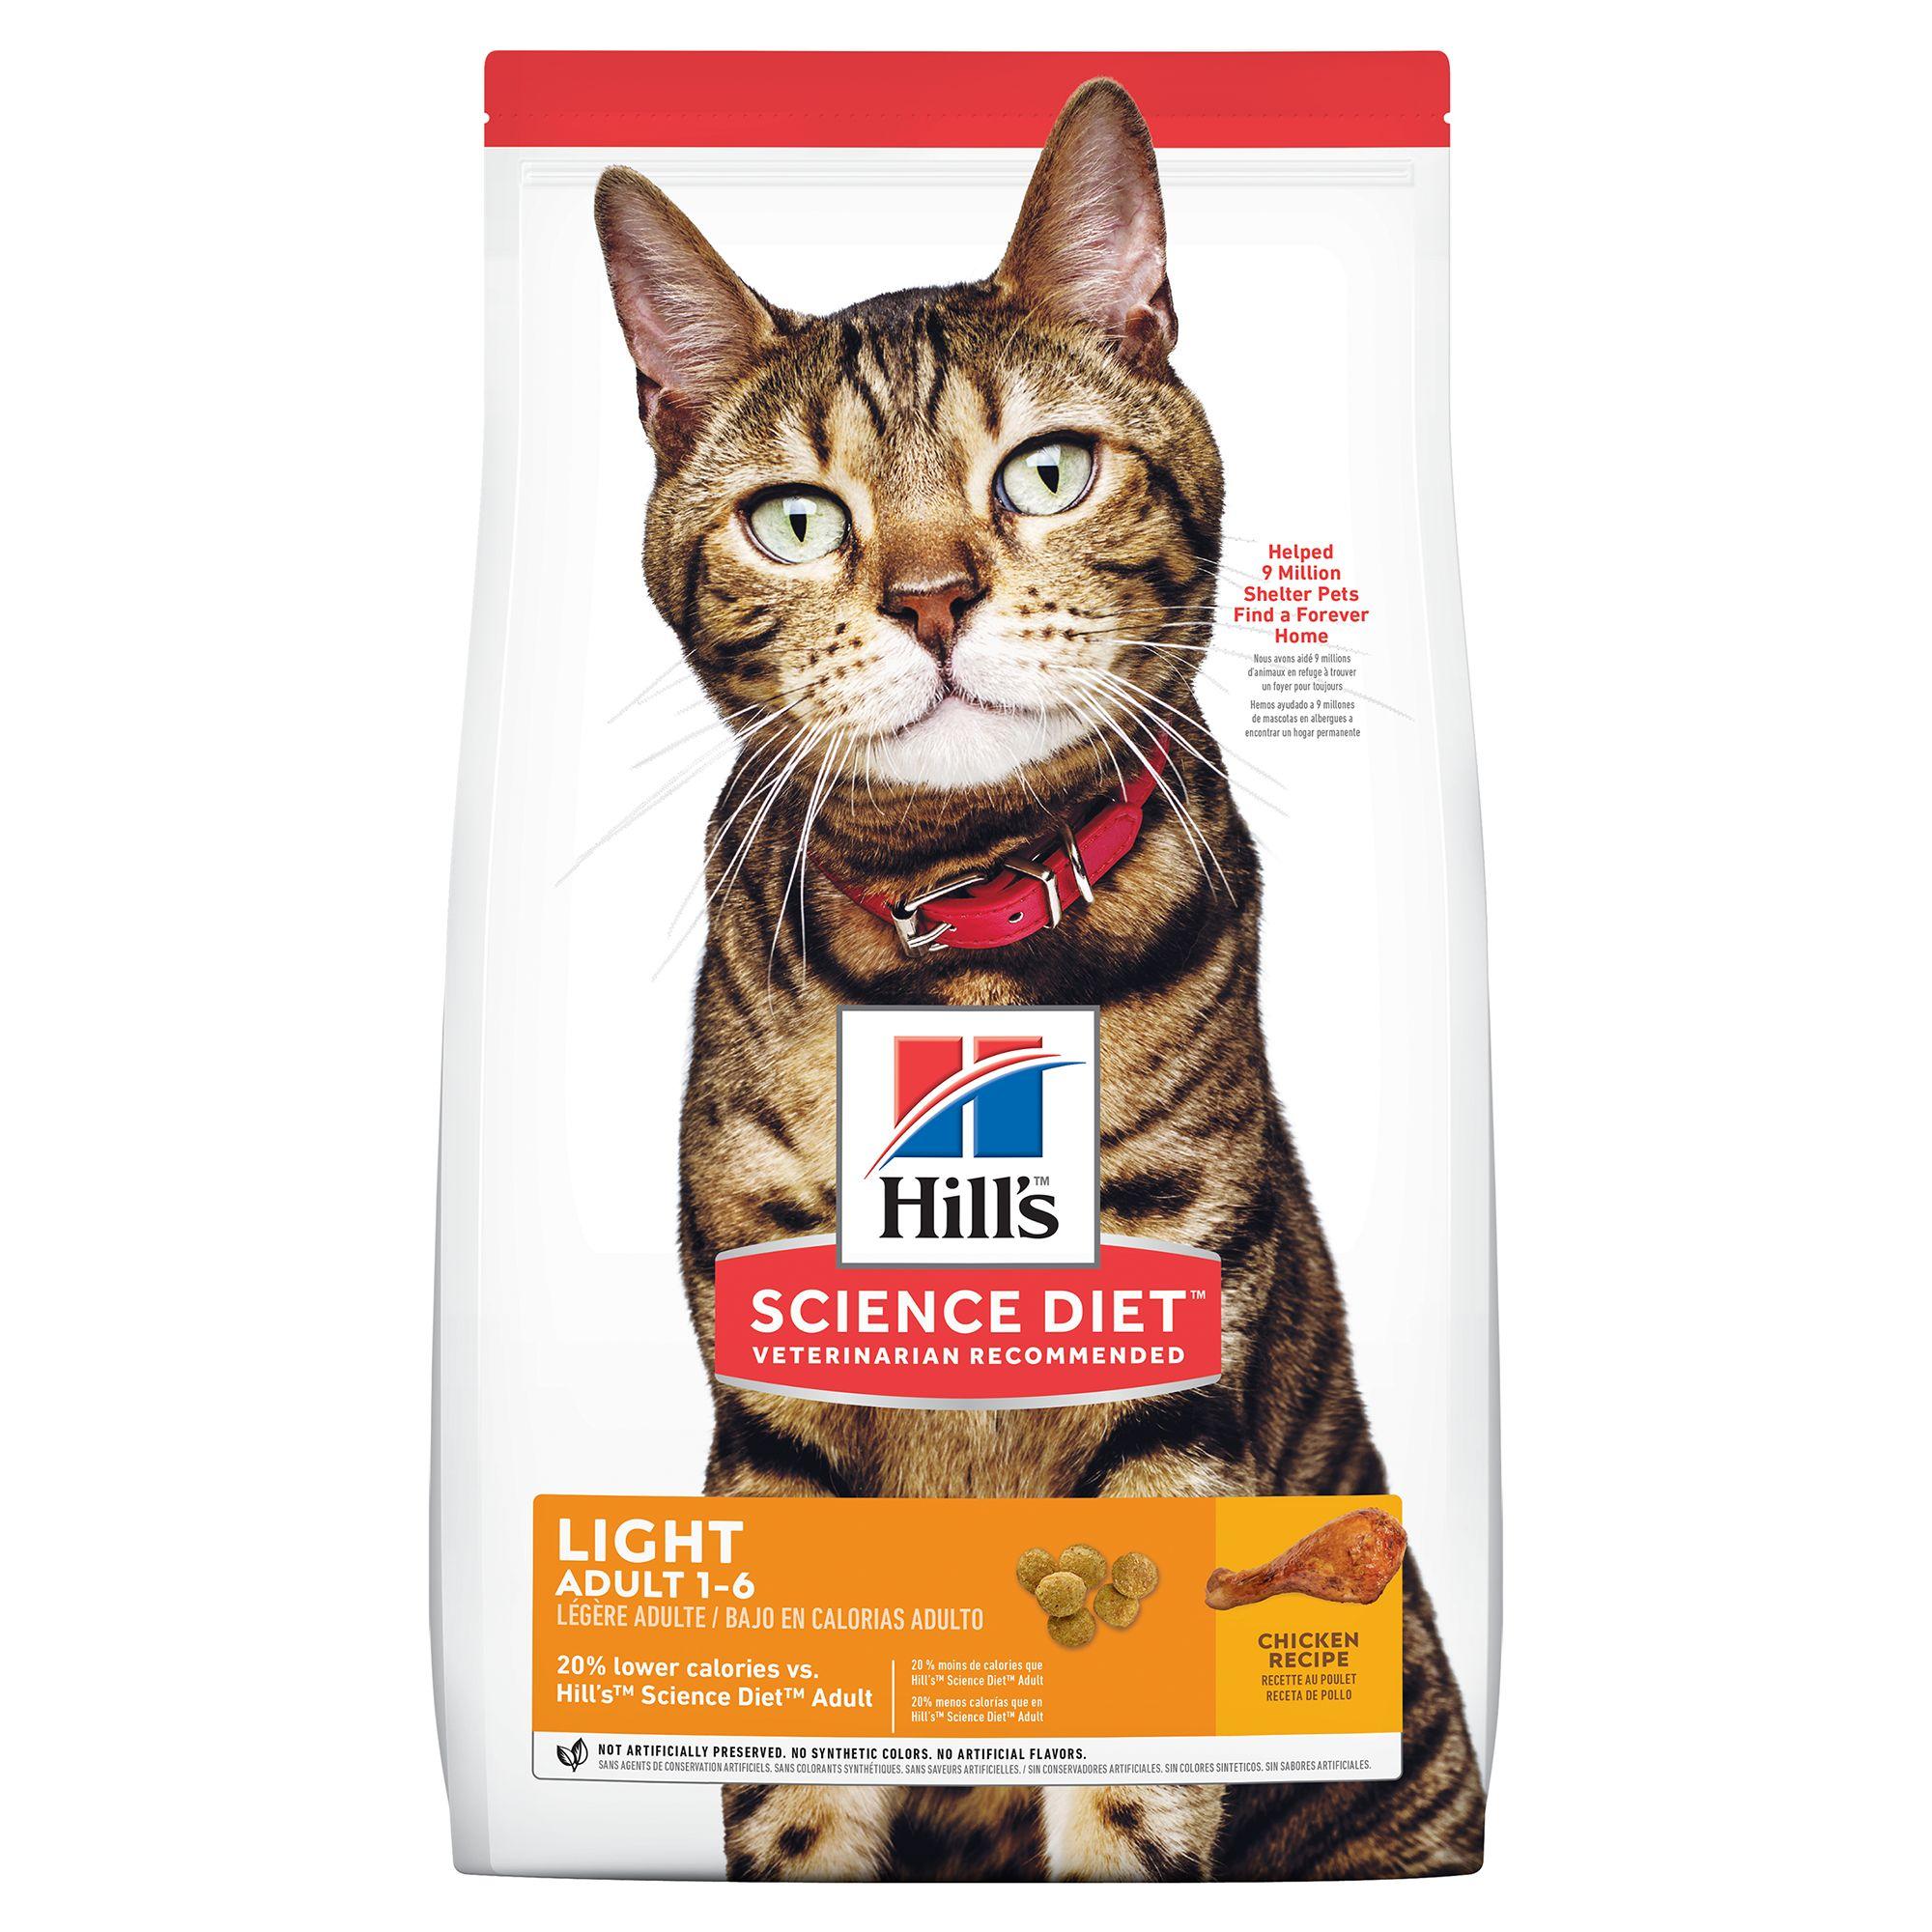 purina pro plan vs hills science diet kitten